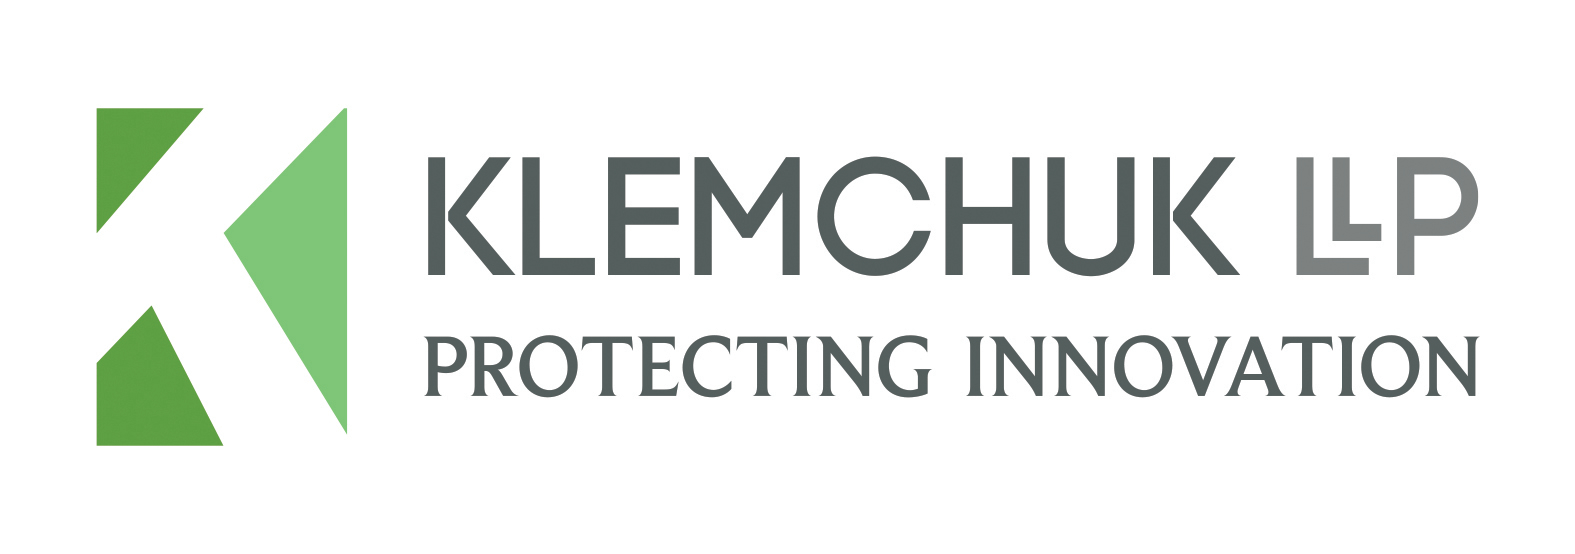 Klemchuk LLP